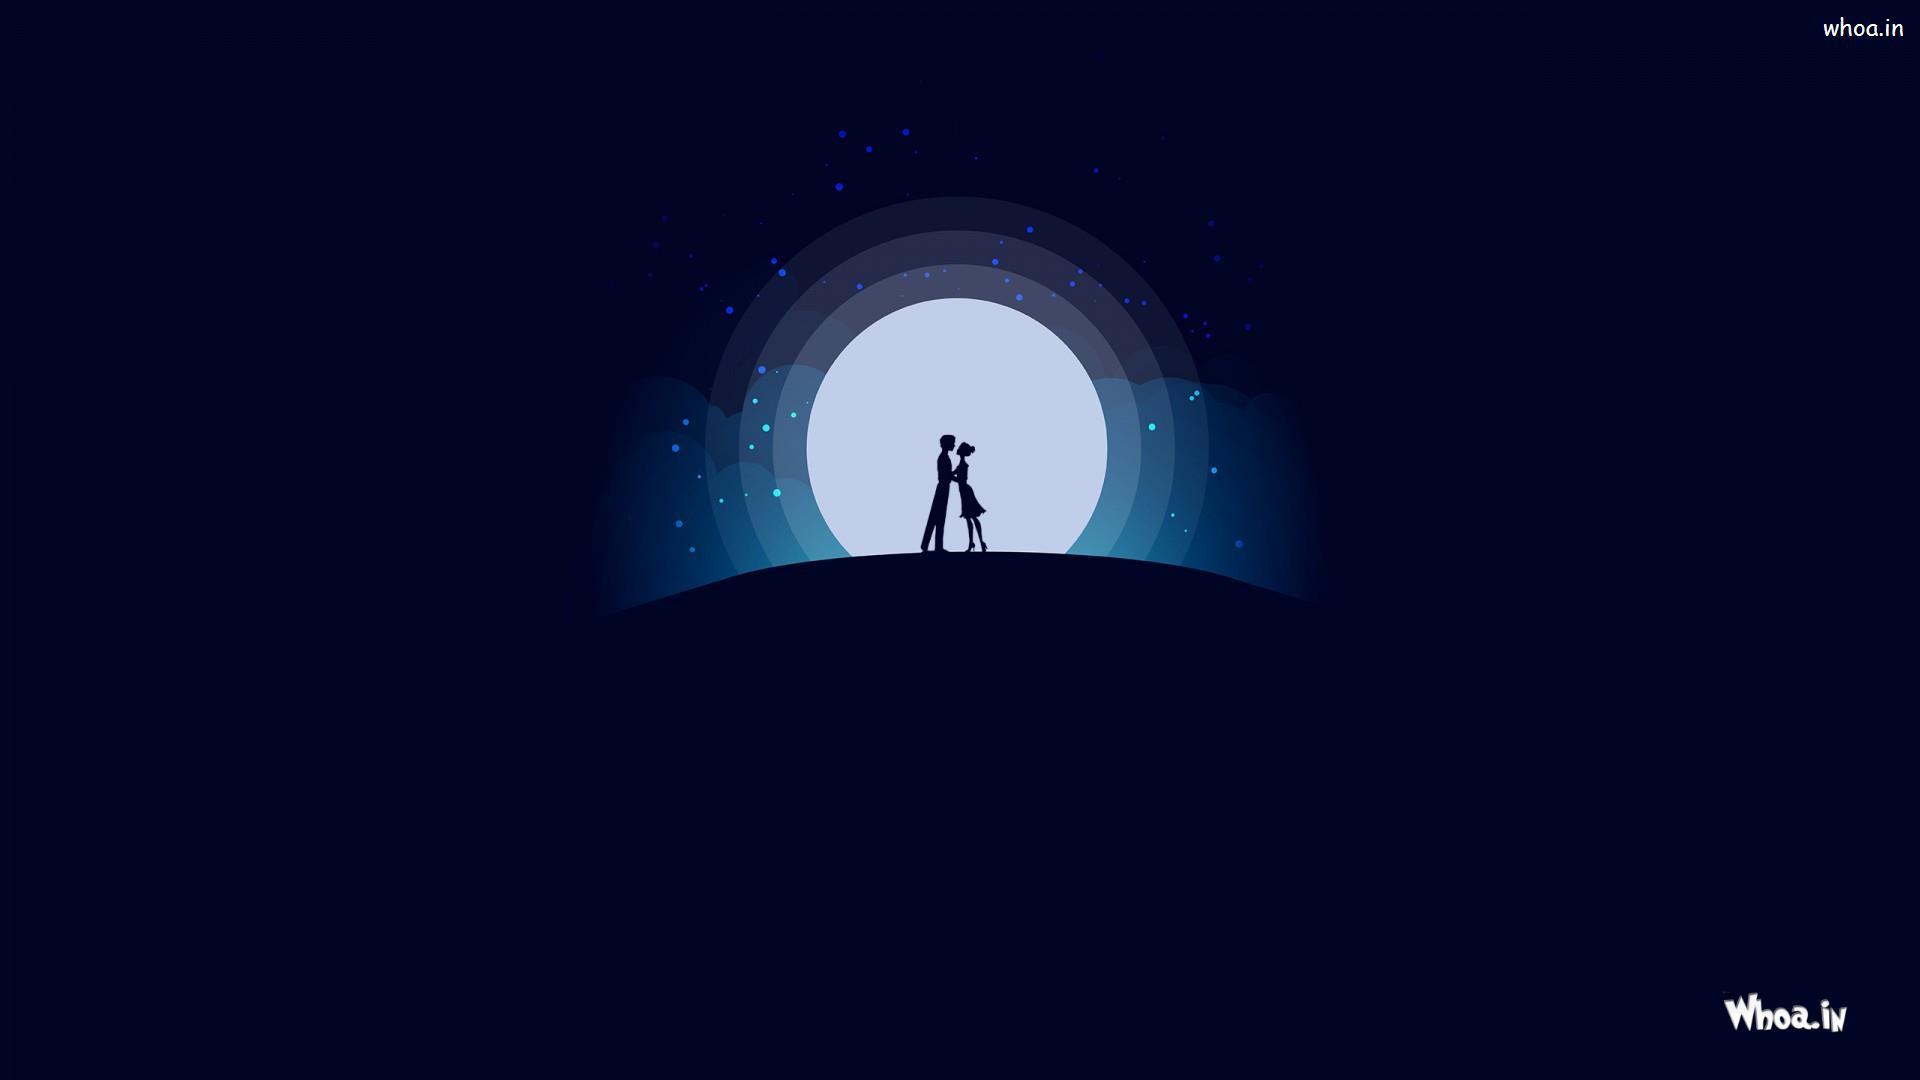 Love Cute Couple Wallpaper 4k Image Blue Background